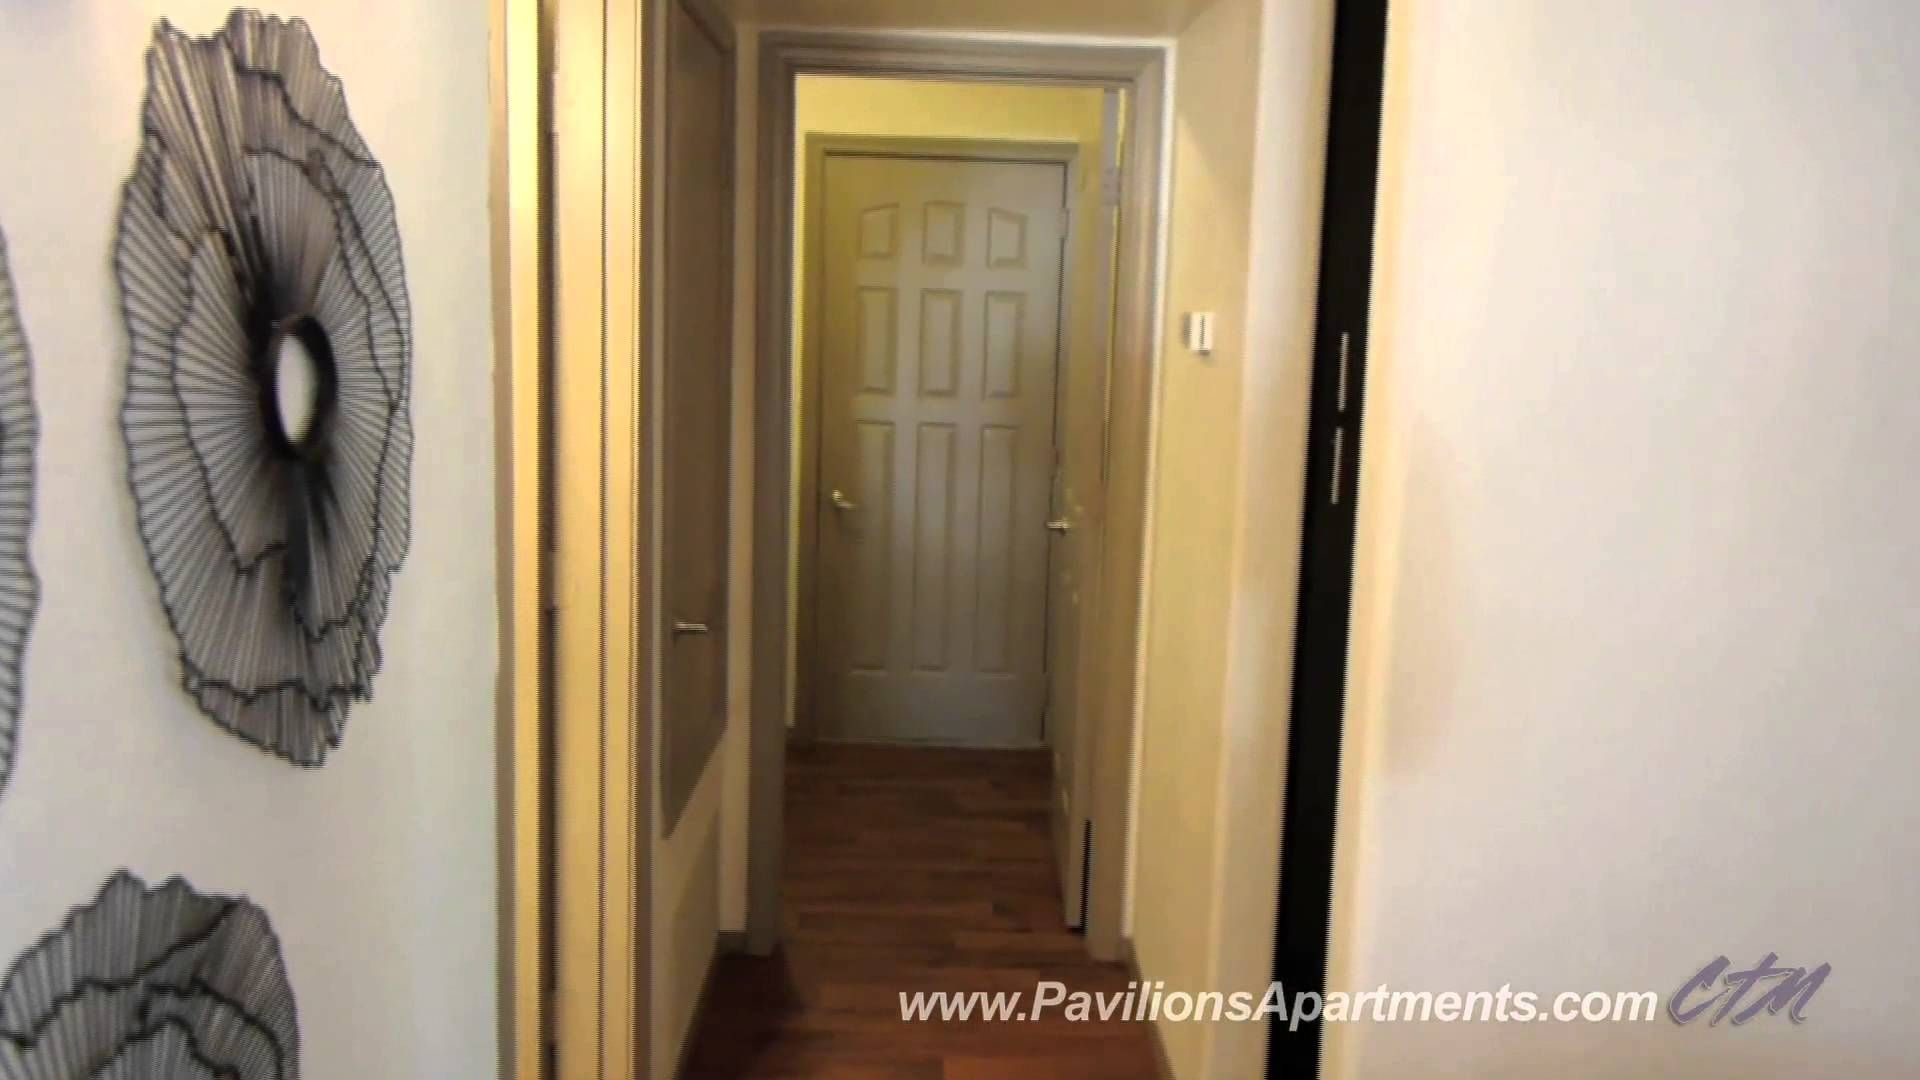 Pavilions Apartments (2 Bedroom, 2 Baths) Walkthrough